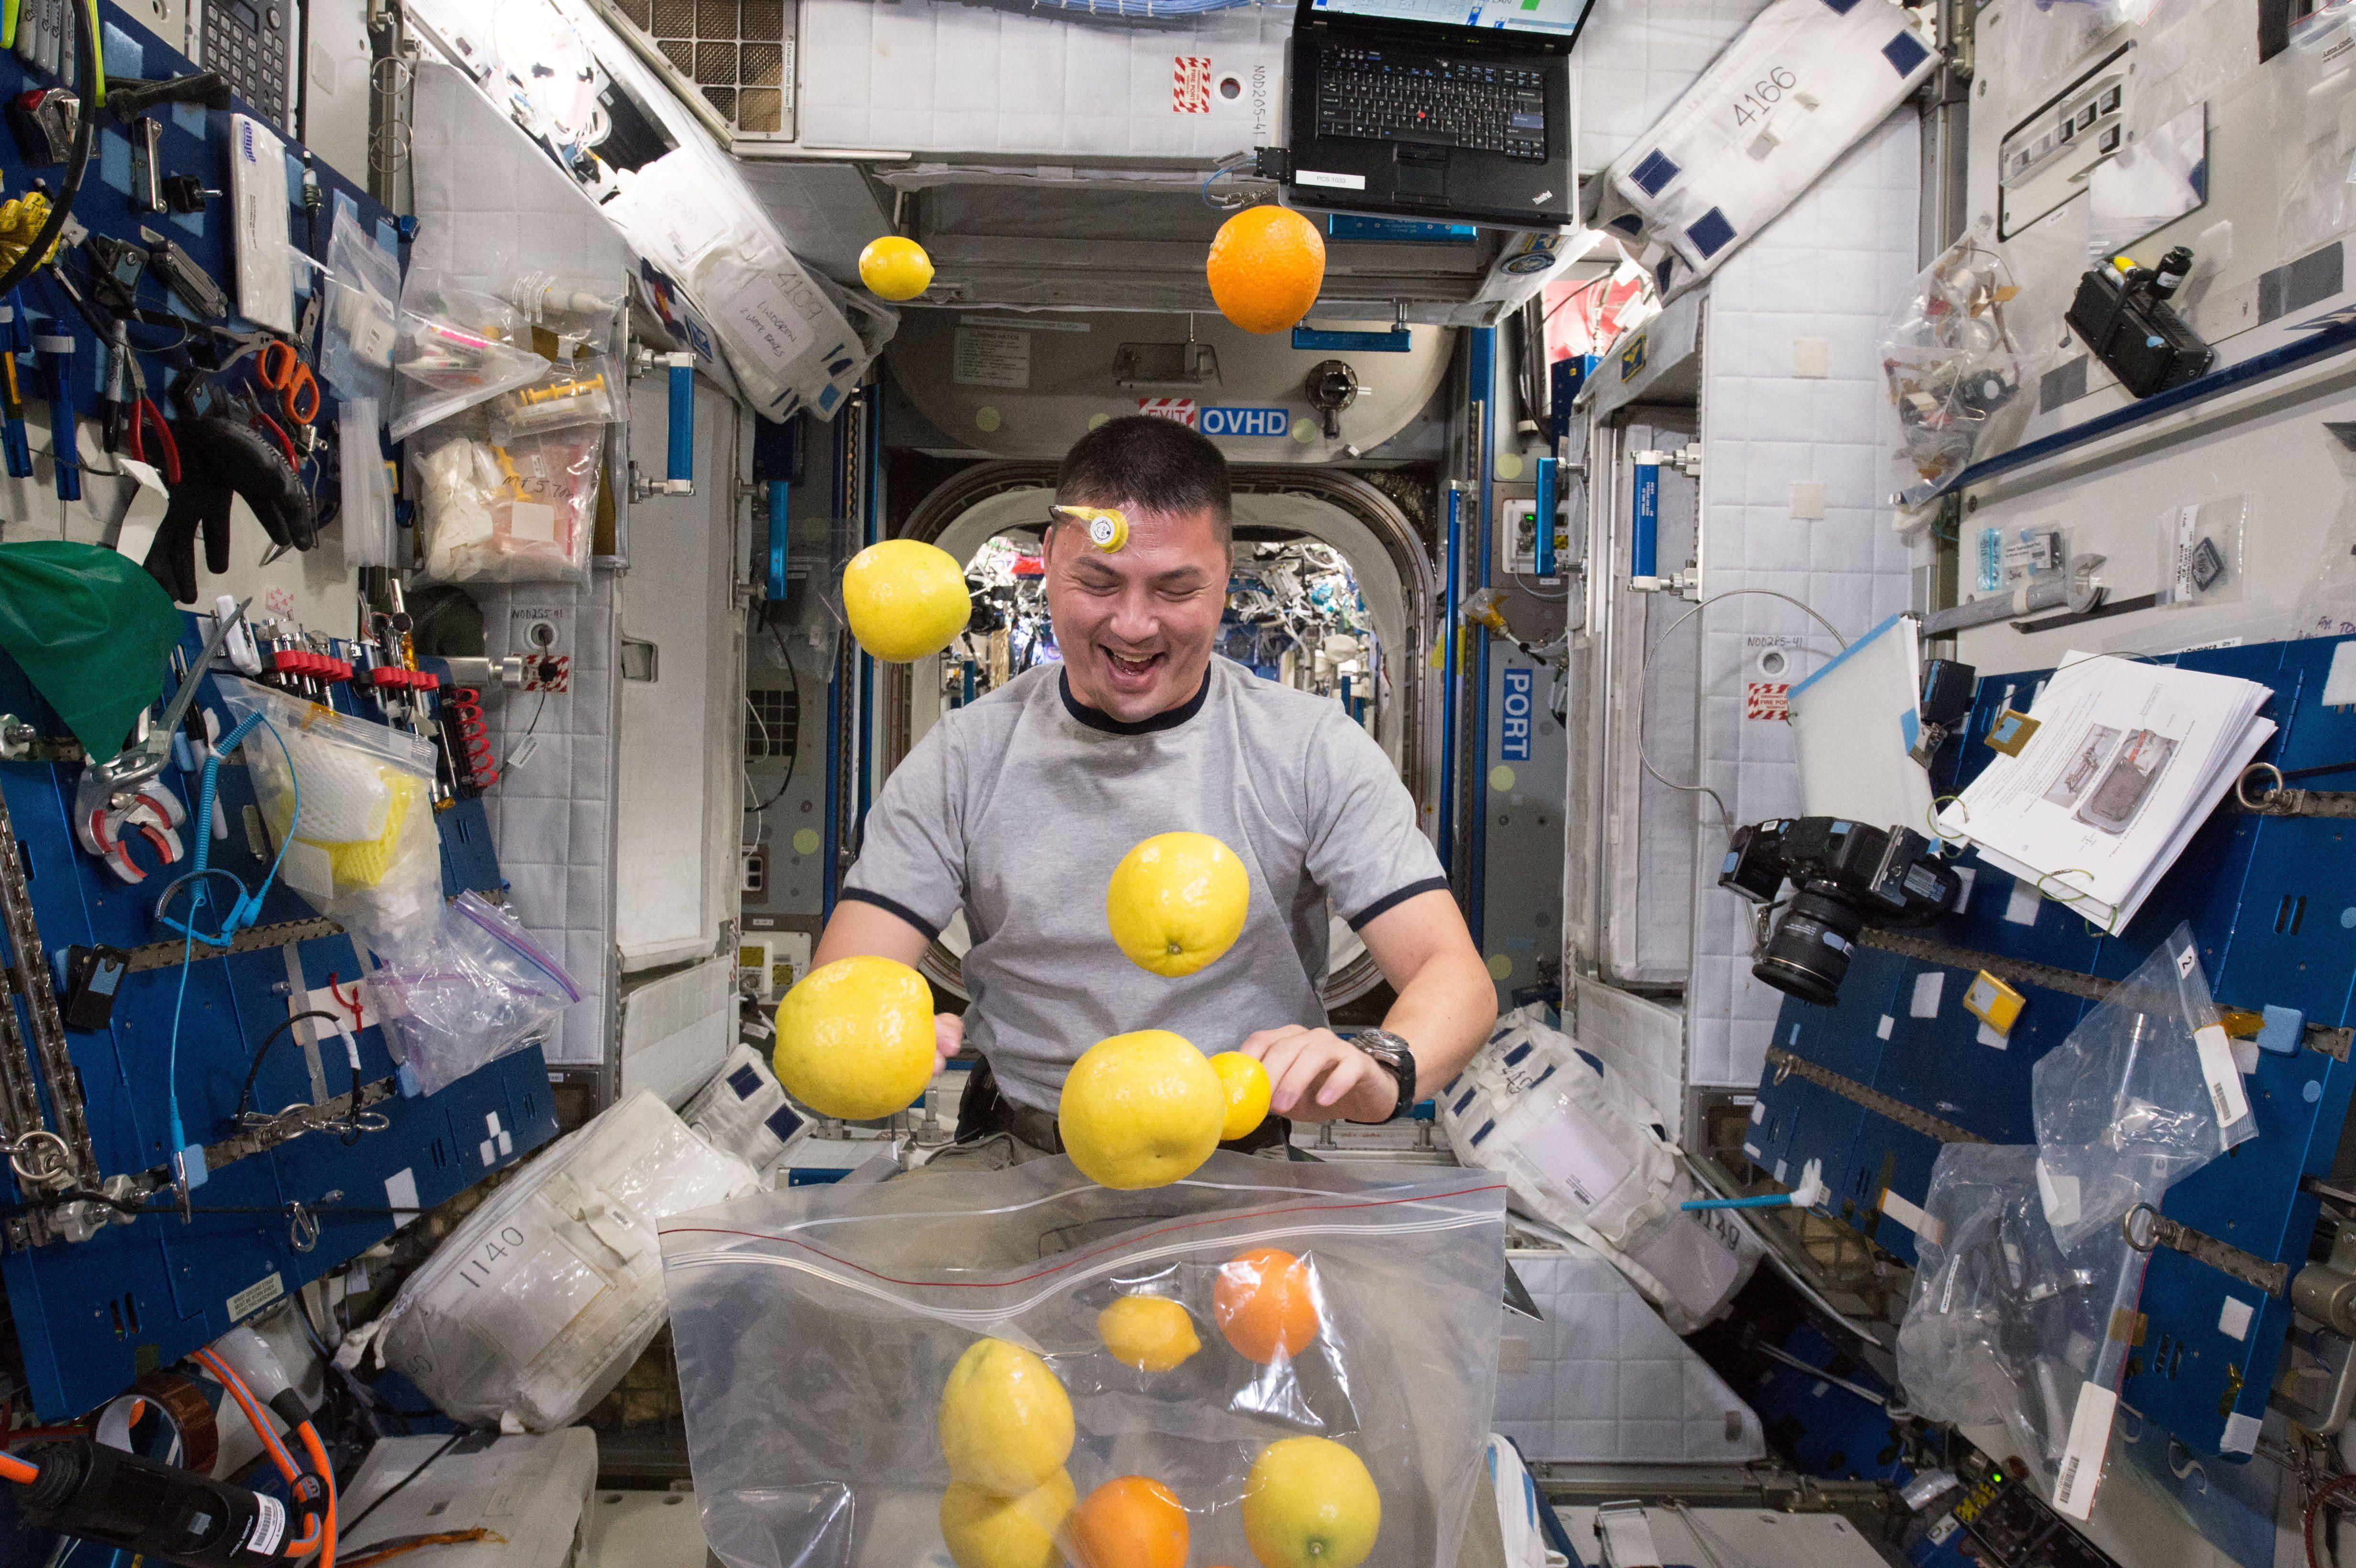 astronaut life in spaceship - photo #1